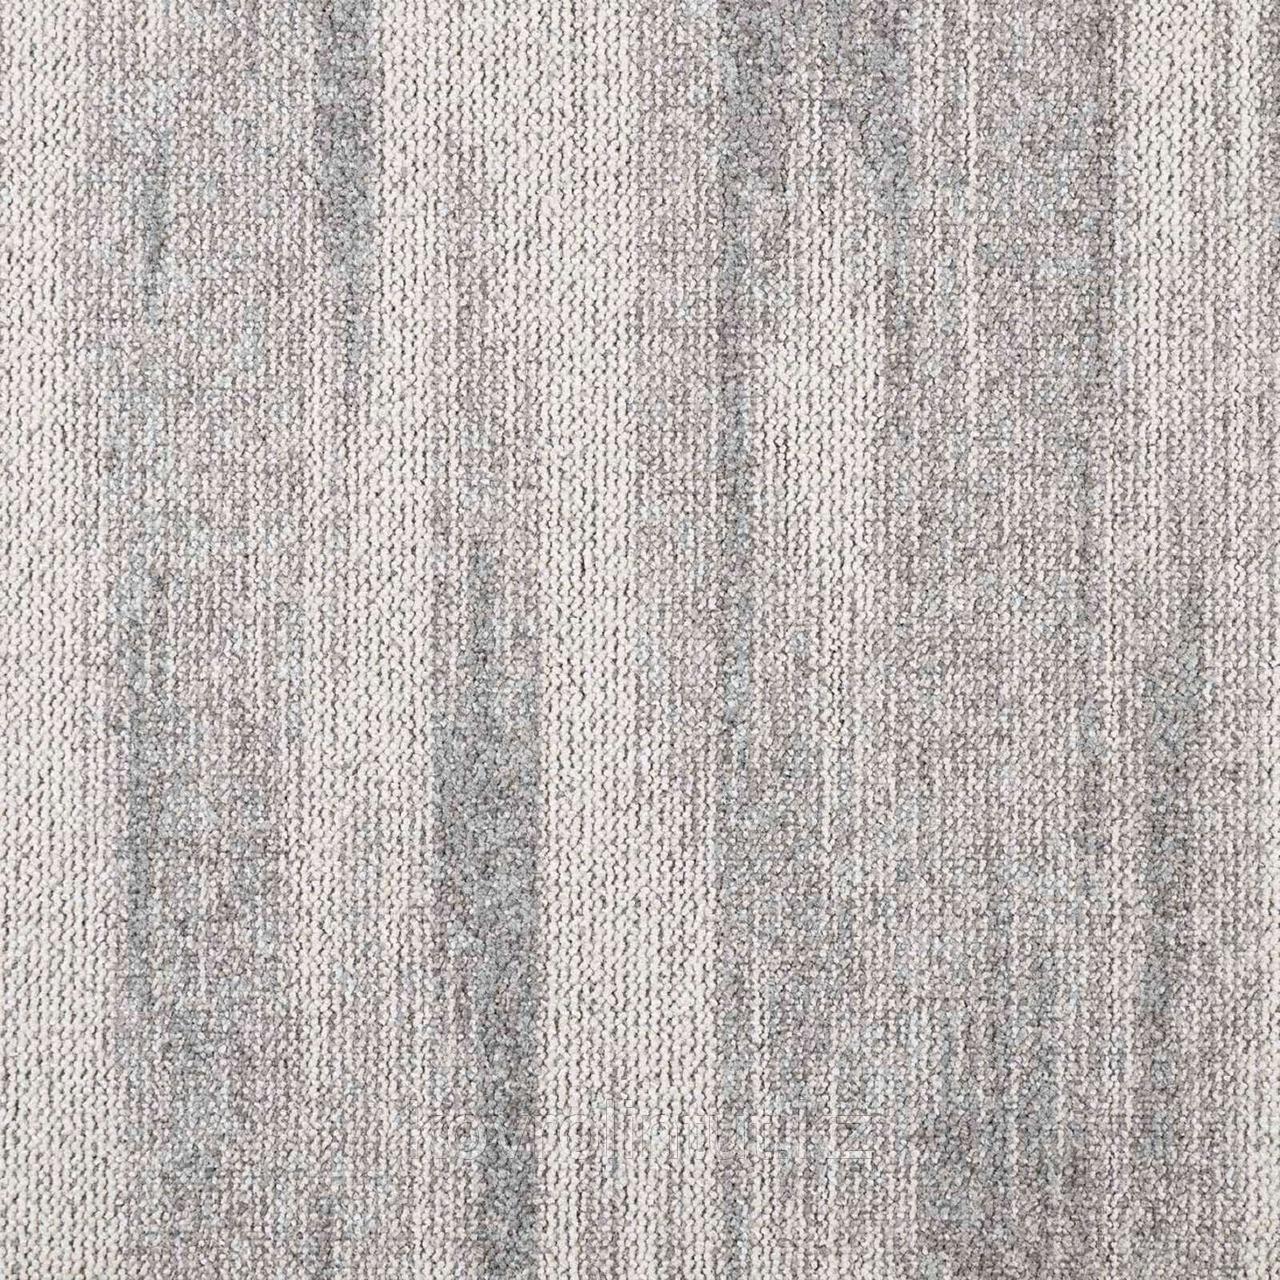 Плитка ковровая Modulyss DSGN Track 912, 100% PA